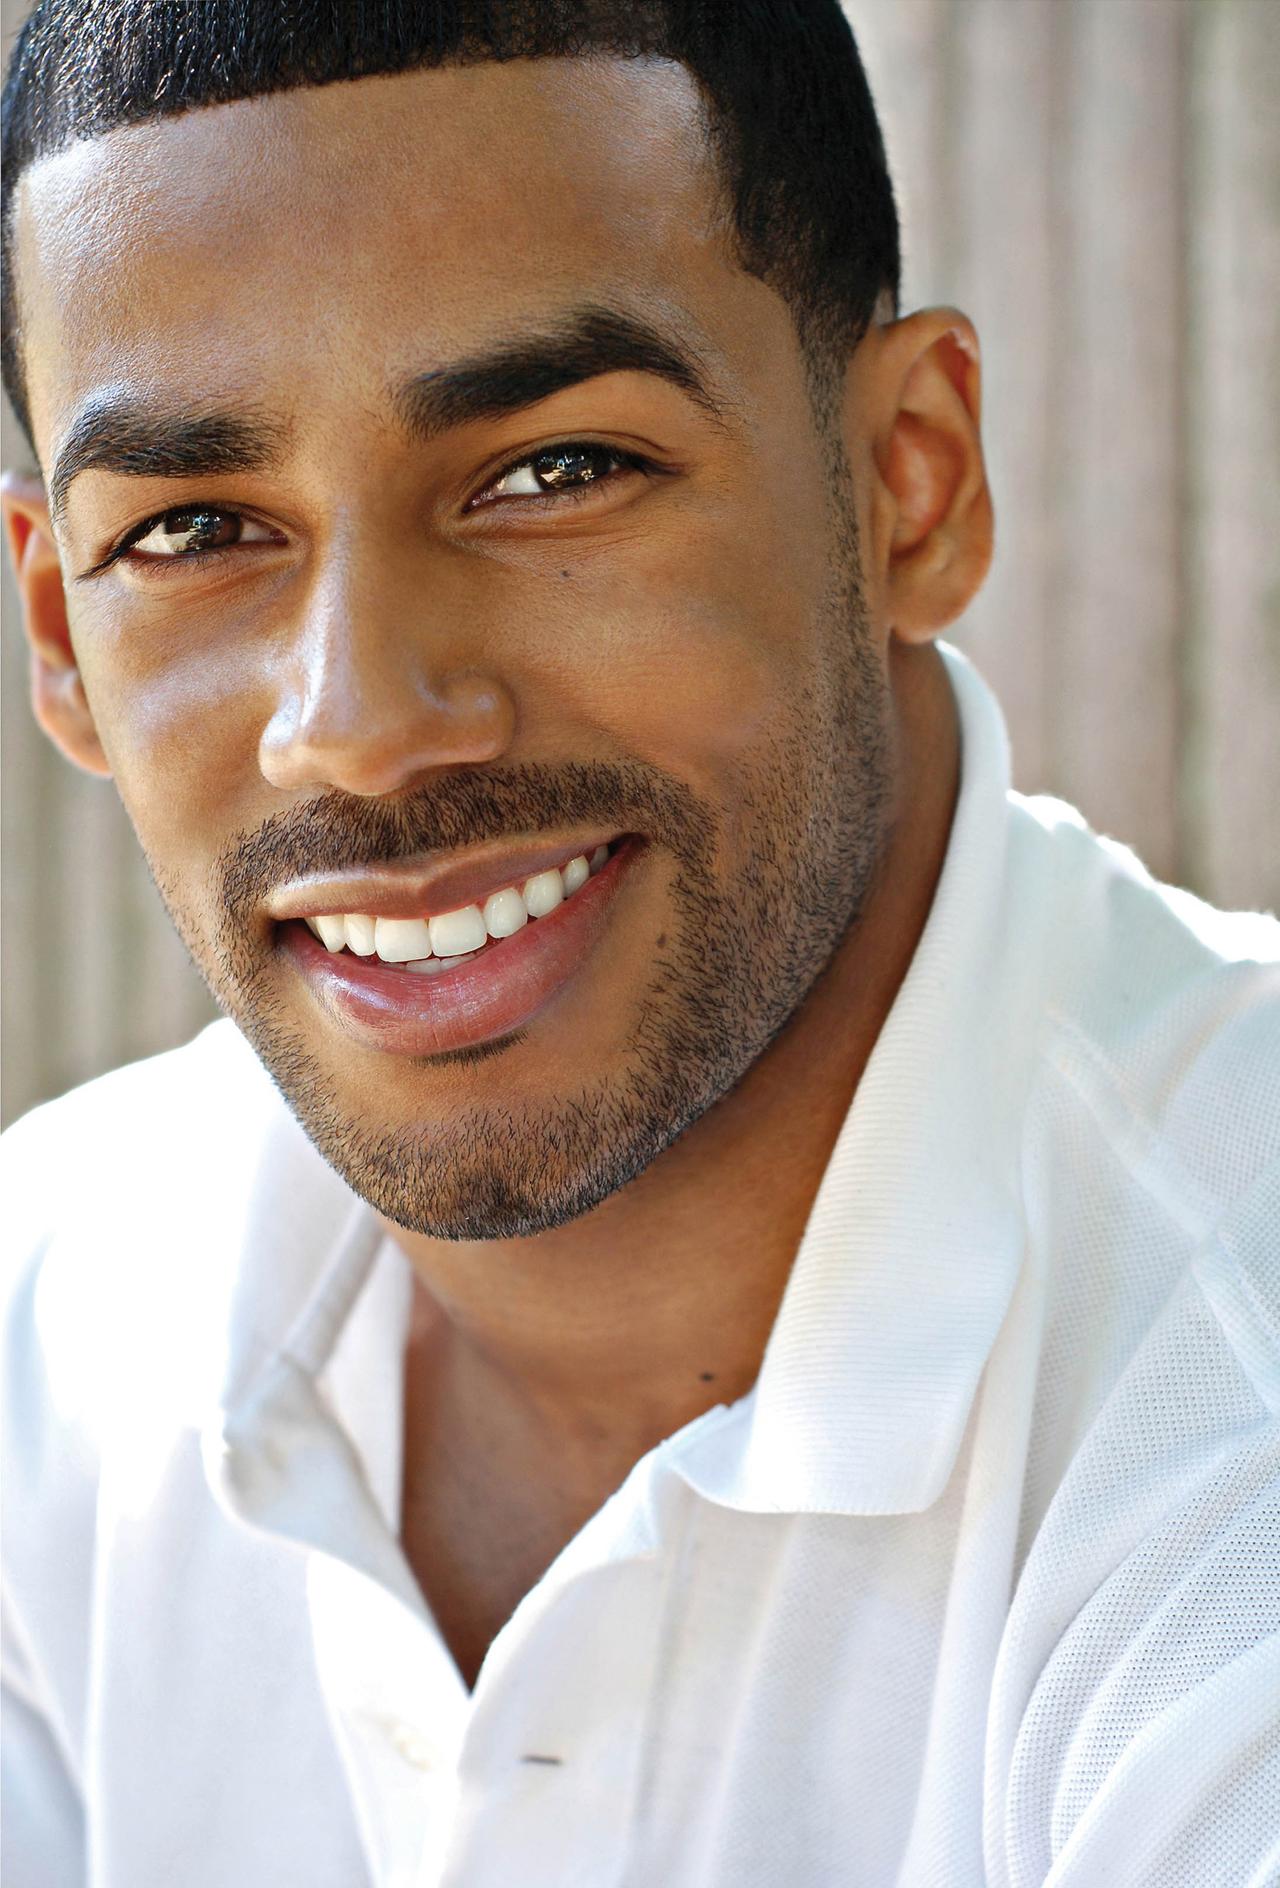 Very handsomelovely lil smile! | SEXY BLACK MEN | Pinterest